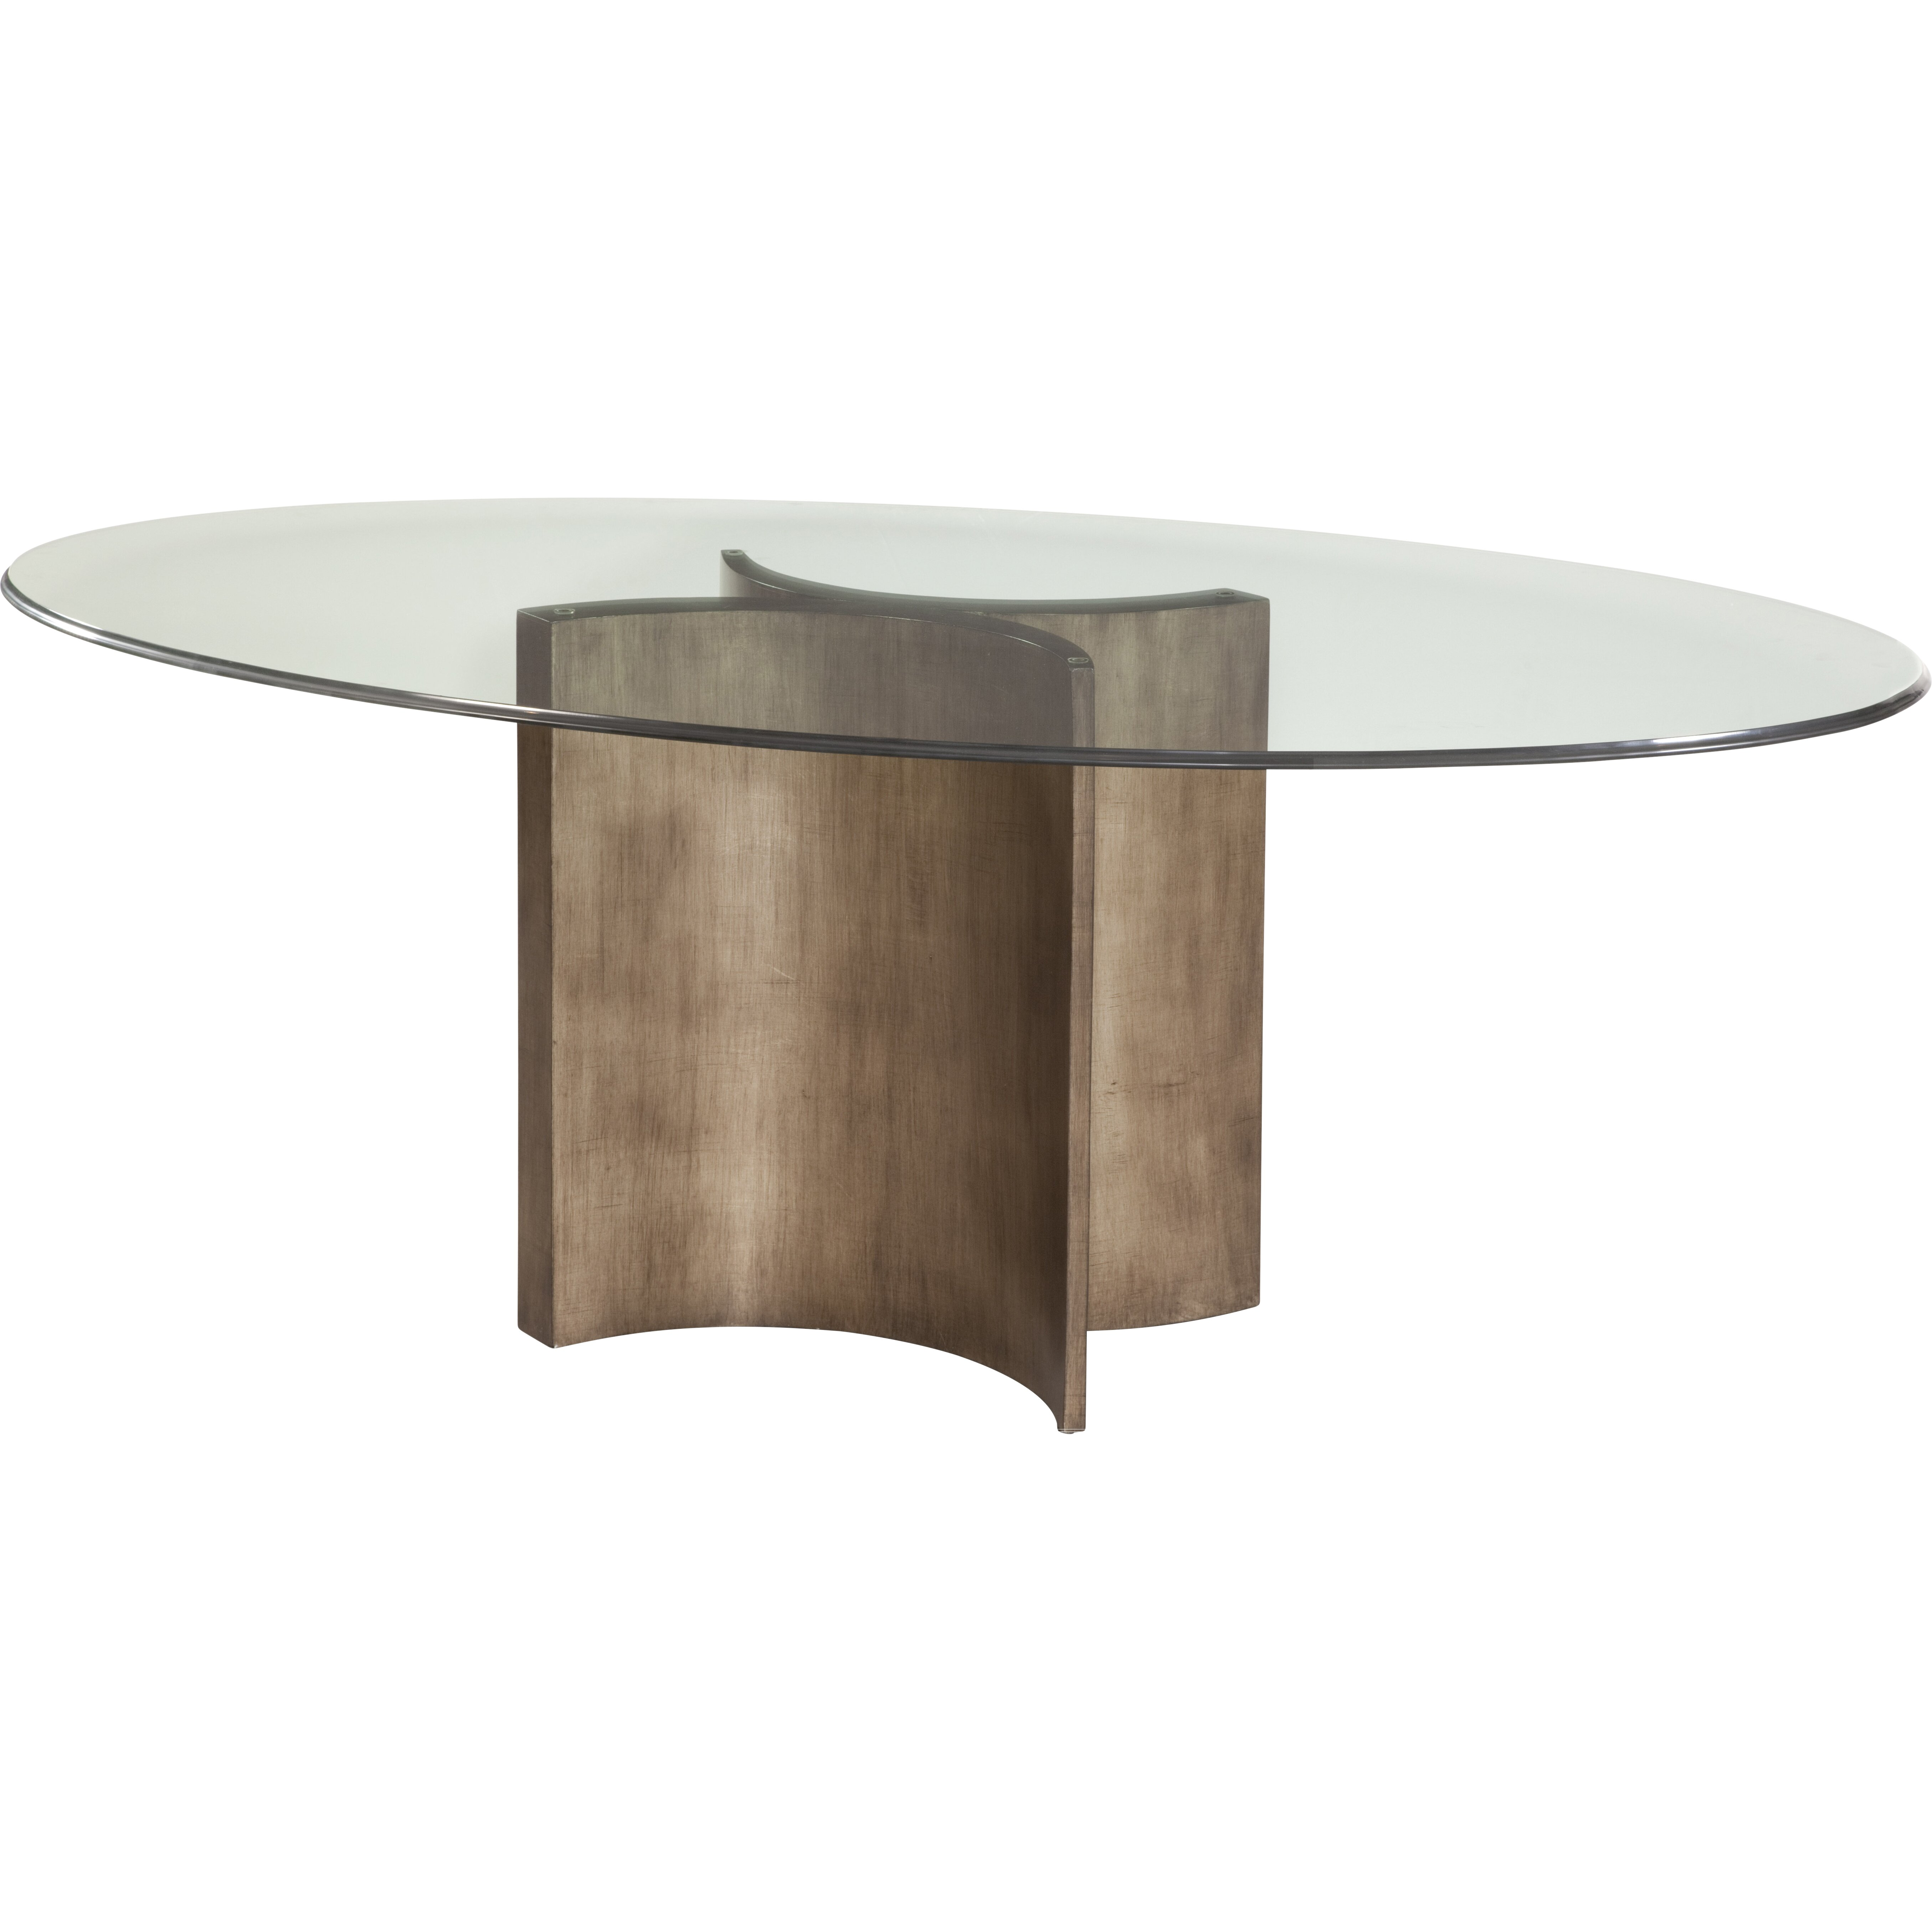 Bassett Mirror Symmetry Dining Table amp Reviews Wayfair : Bassett Mirror Symmetry Dining Table 2914 700 926EC from www.wayfair.com size 5420 x 5420 jpeg 1298kB